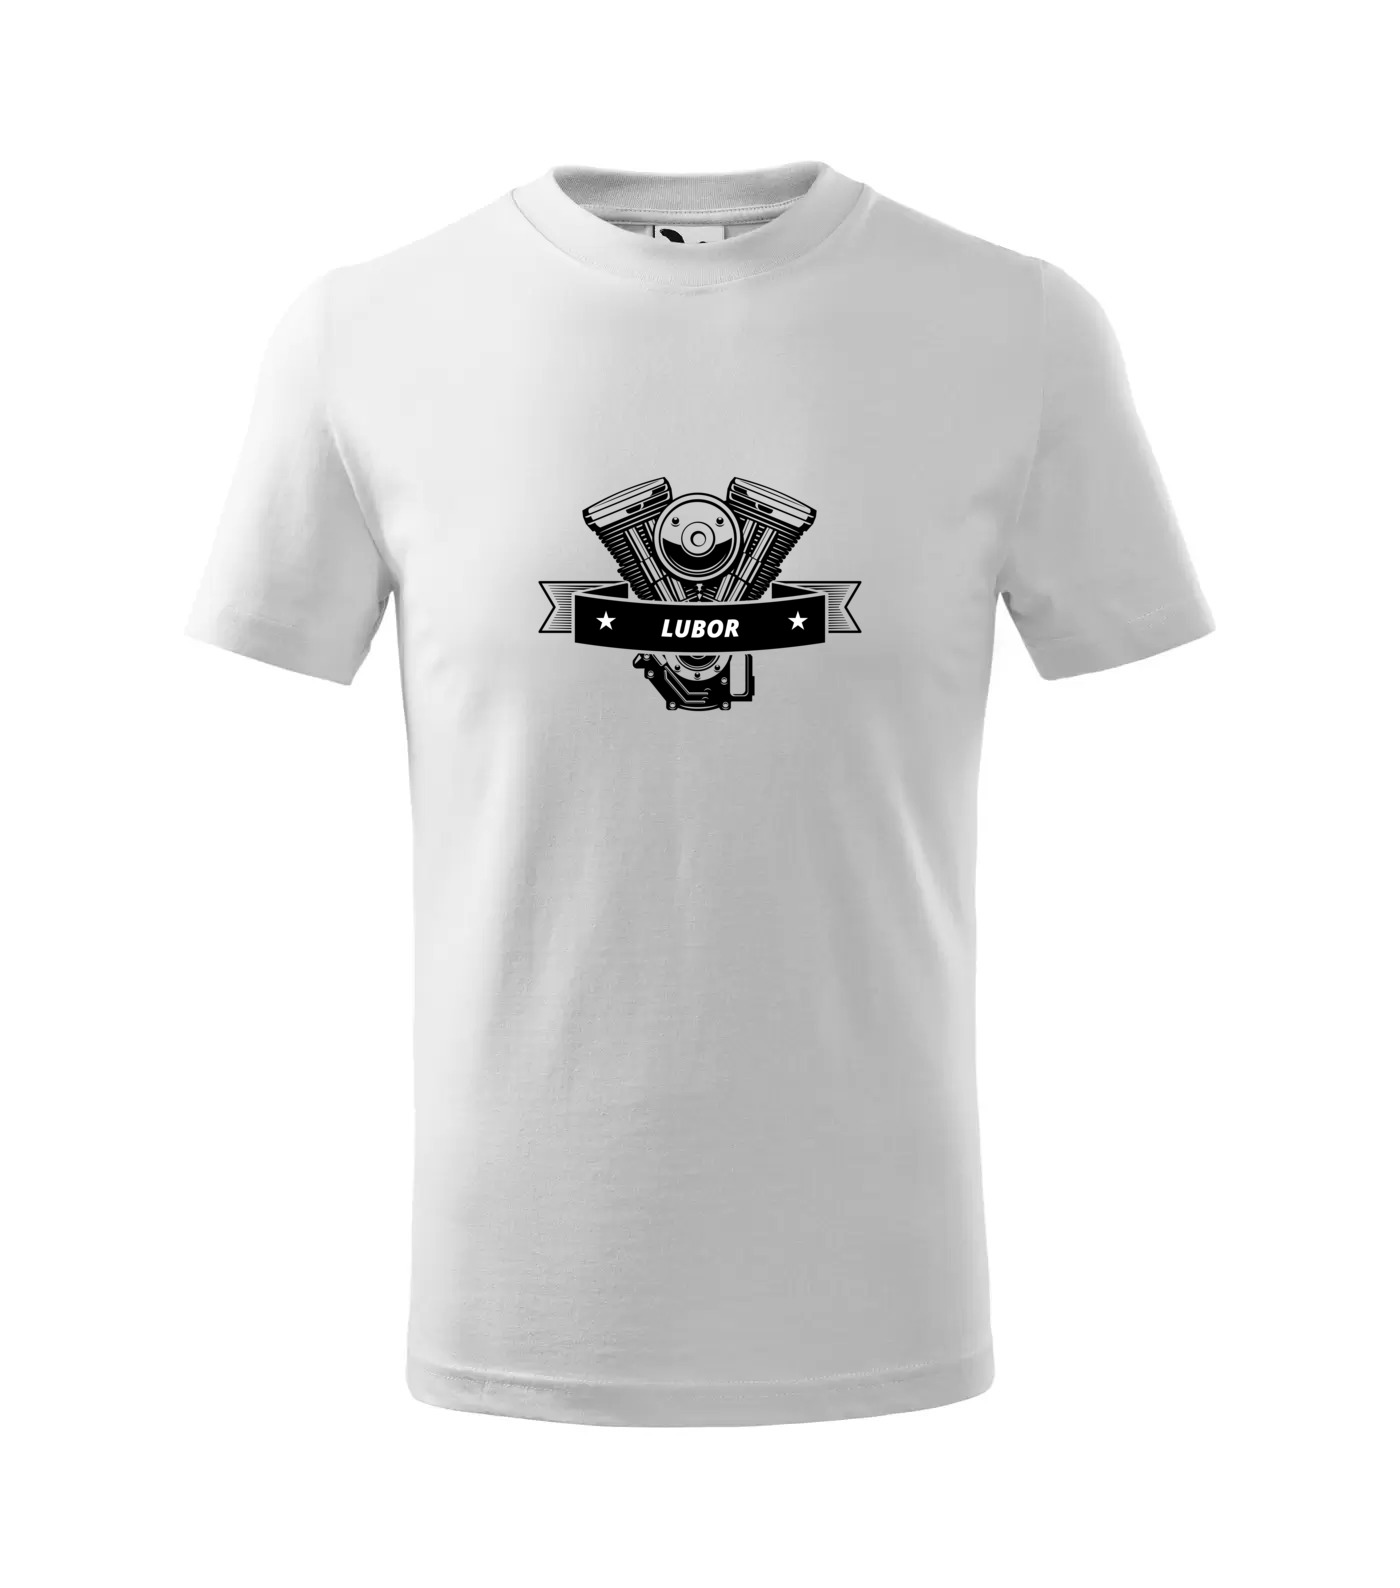 Tričko Motorkář Lubor